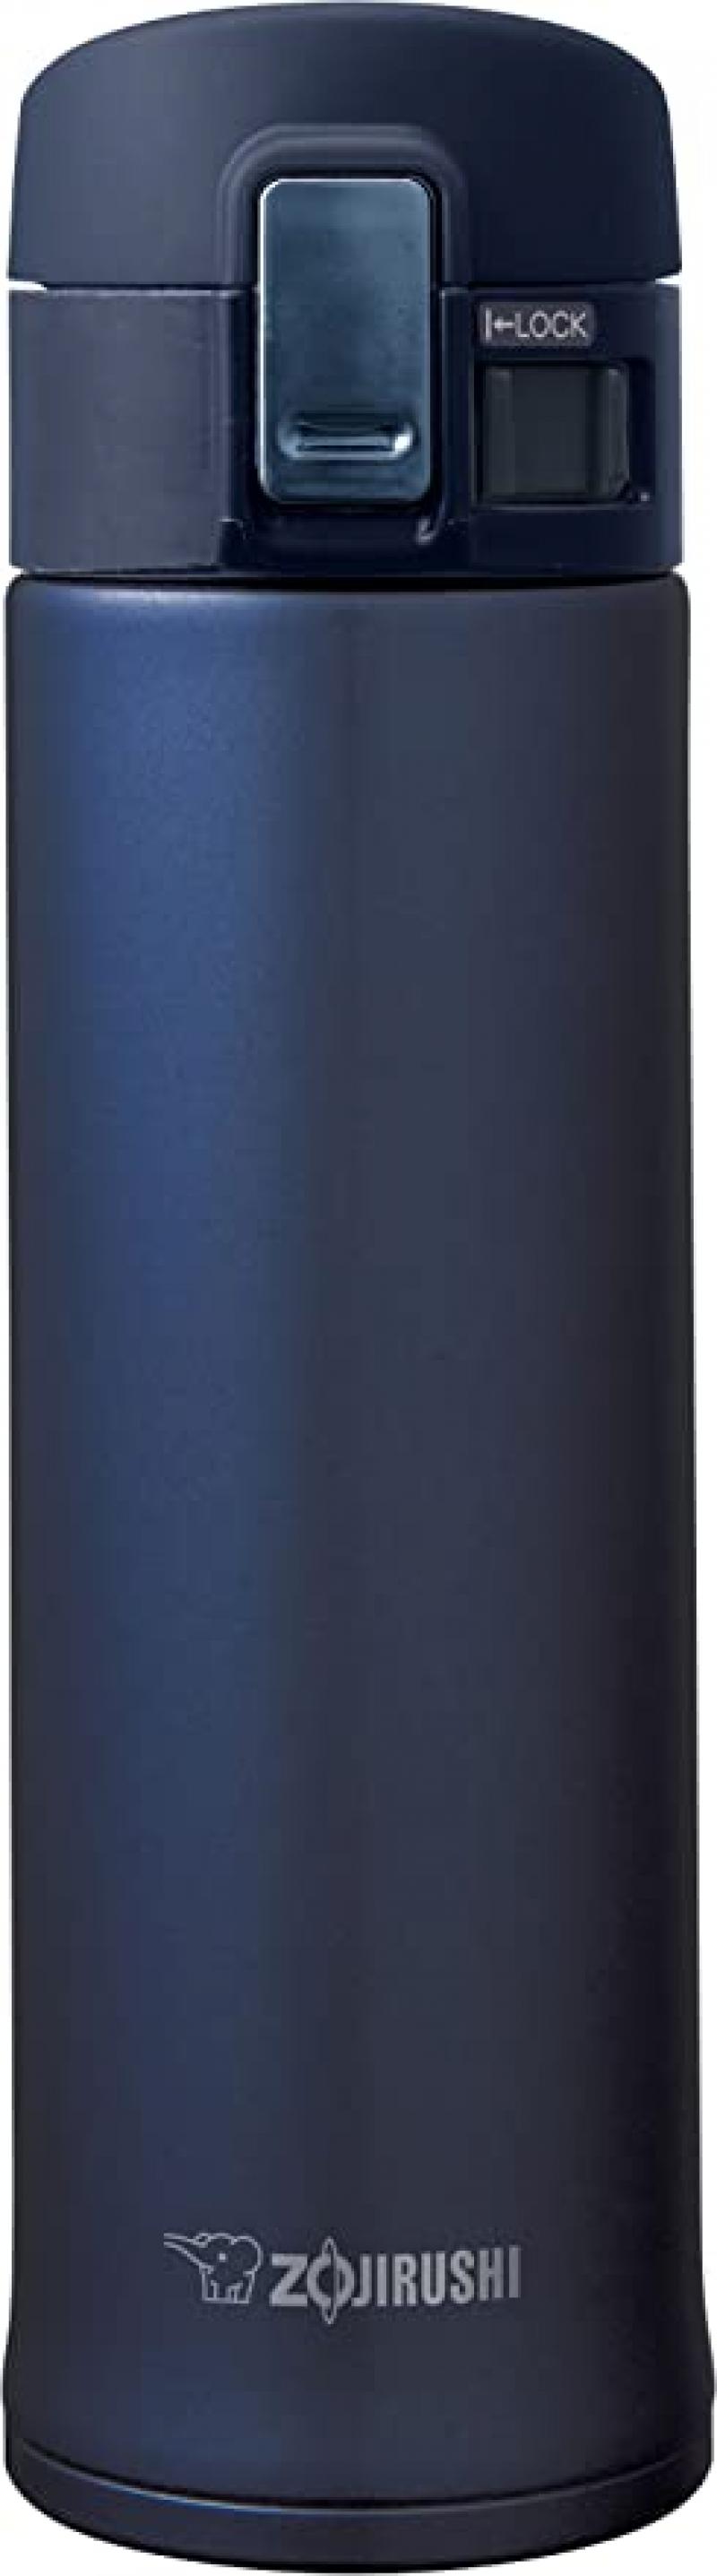 ihocon: Zojirushi Stainless Steel Mug, 16oz, Smoky Blue 象印不銹鋼保温杯